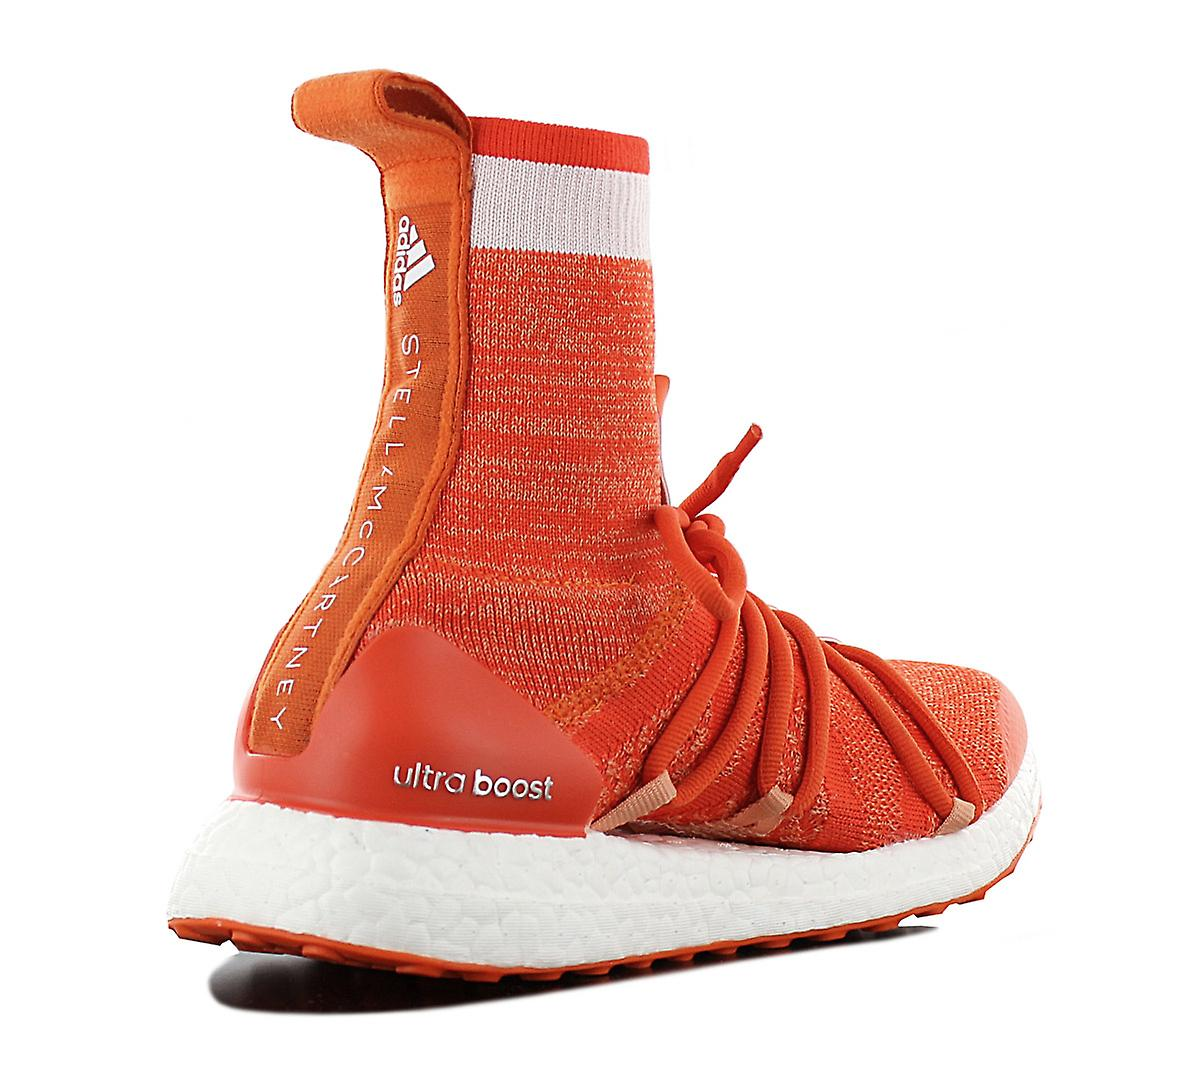 adidas by STELLA MCCARTNEY Ultraboost X Mid CM7736 Women's Shoes Orange Sneakers Sports Shoes